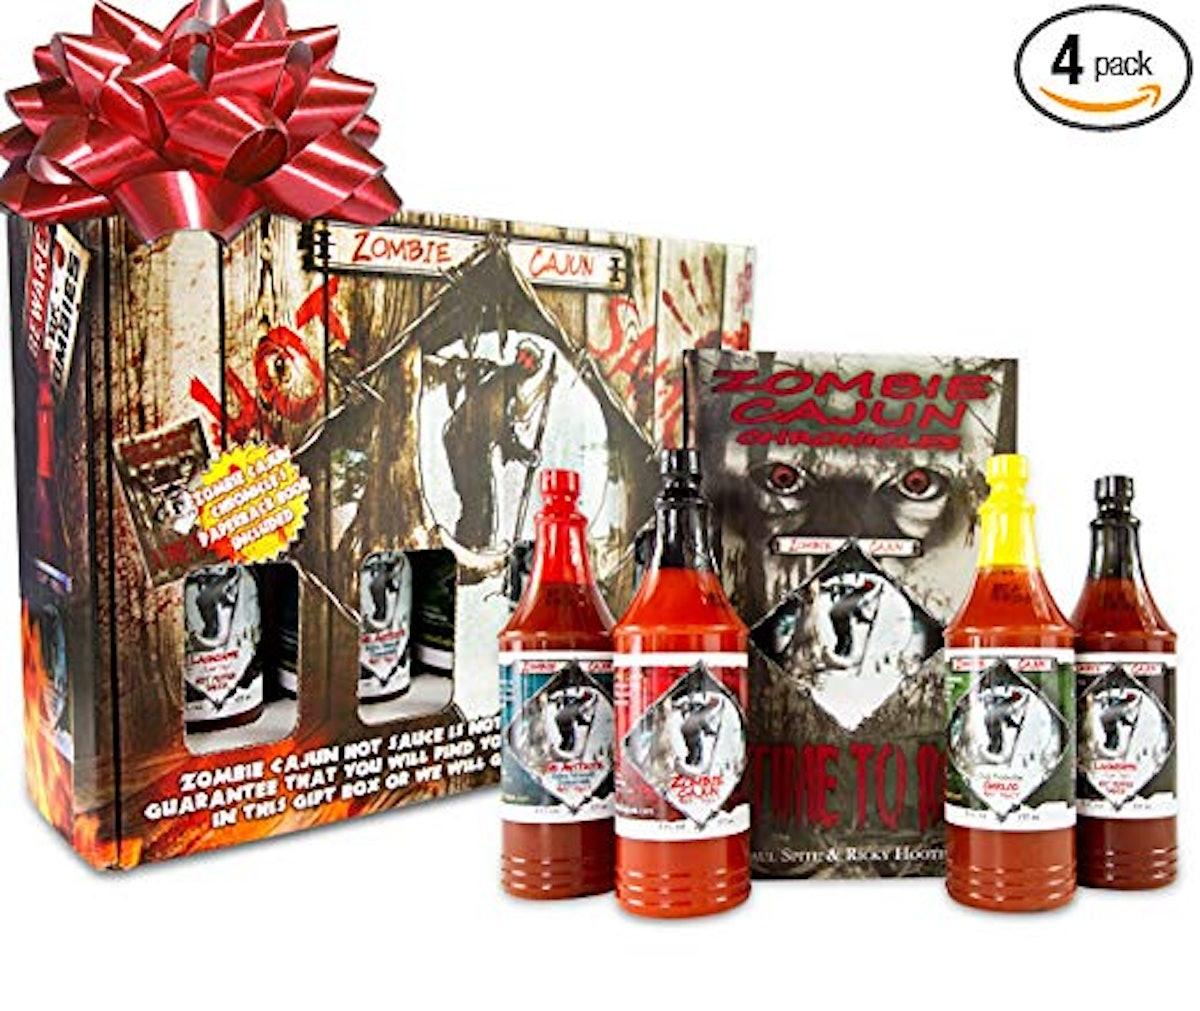 Zombie Cajun Hot Sauce Gift Set